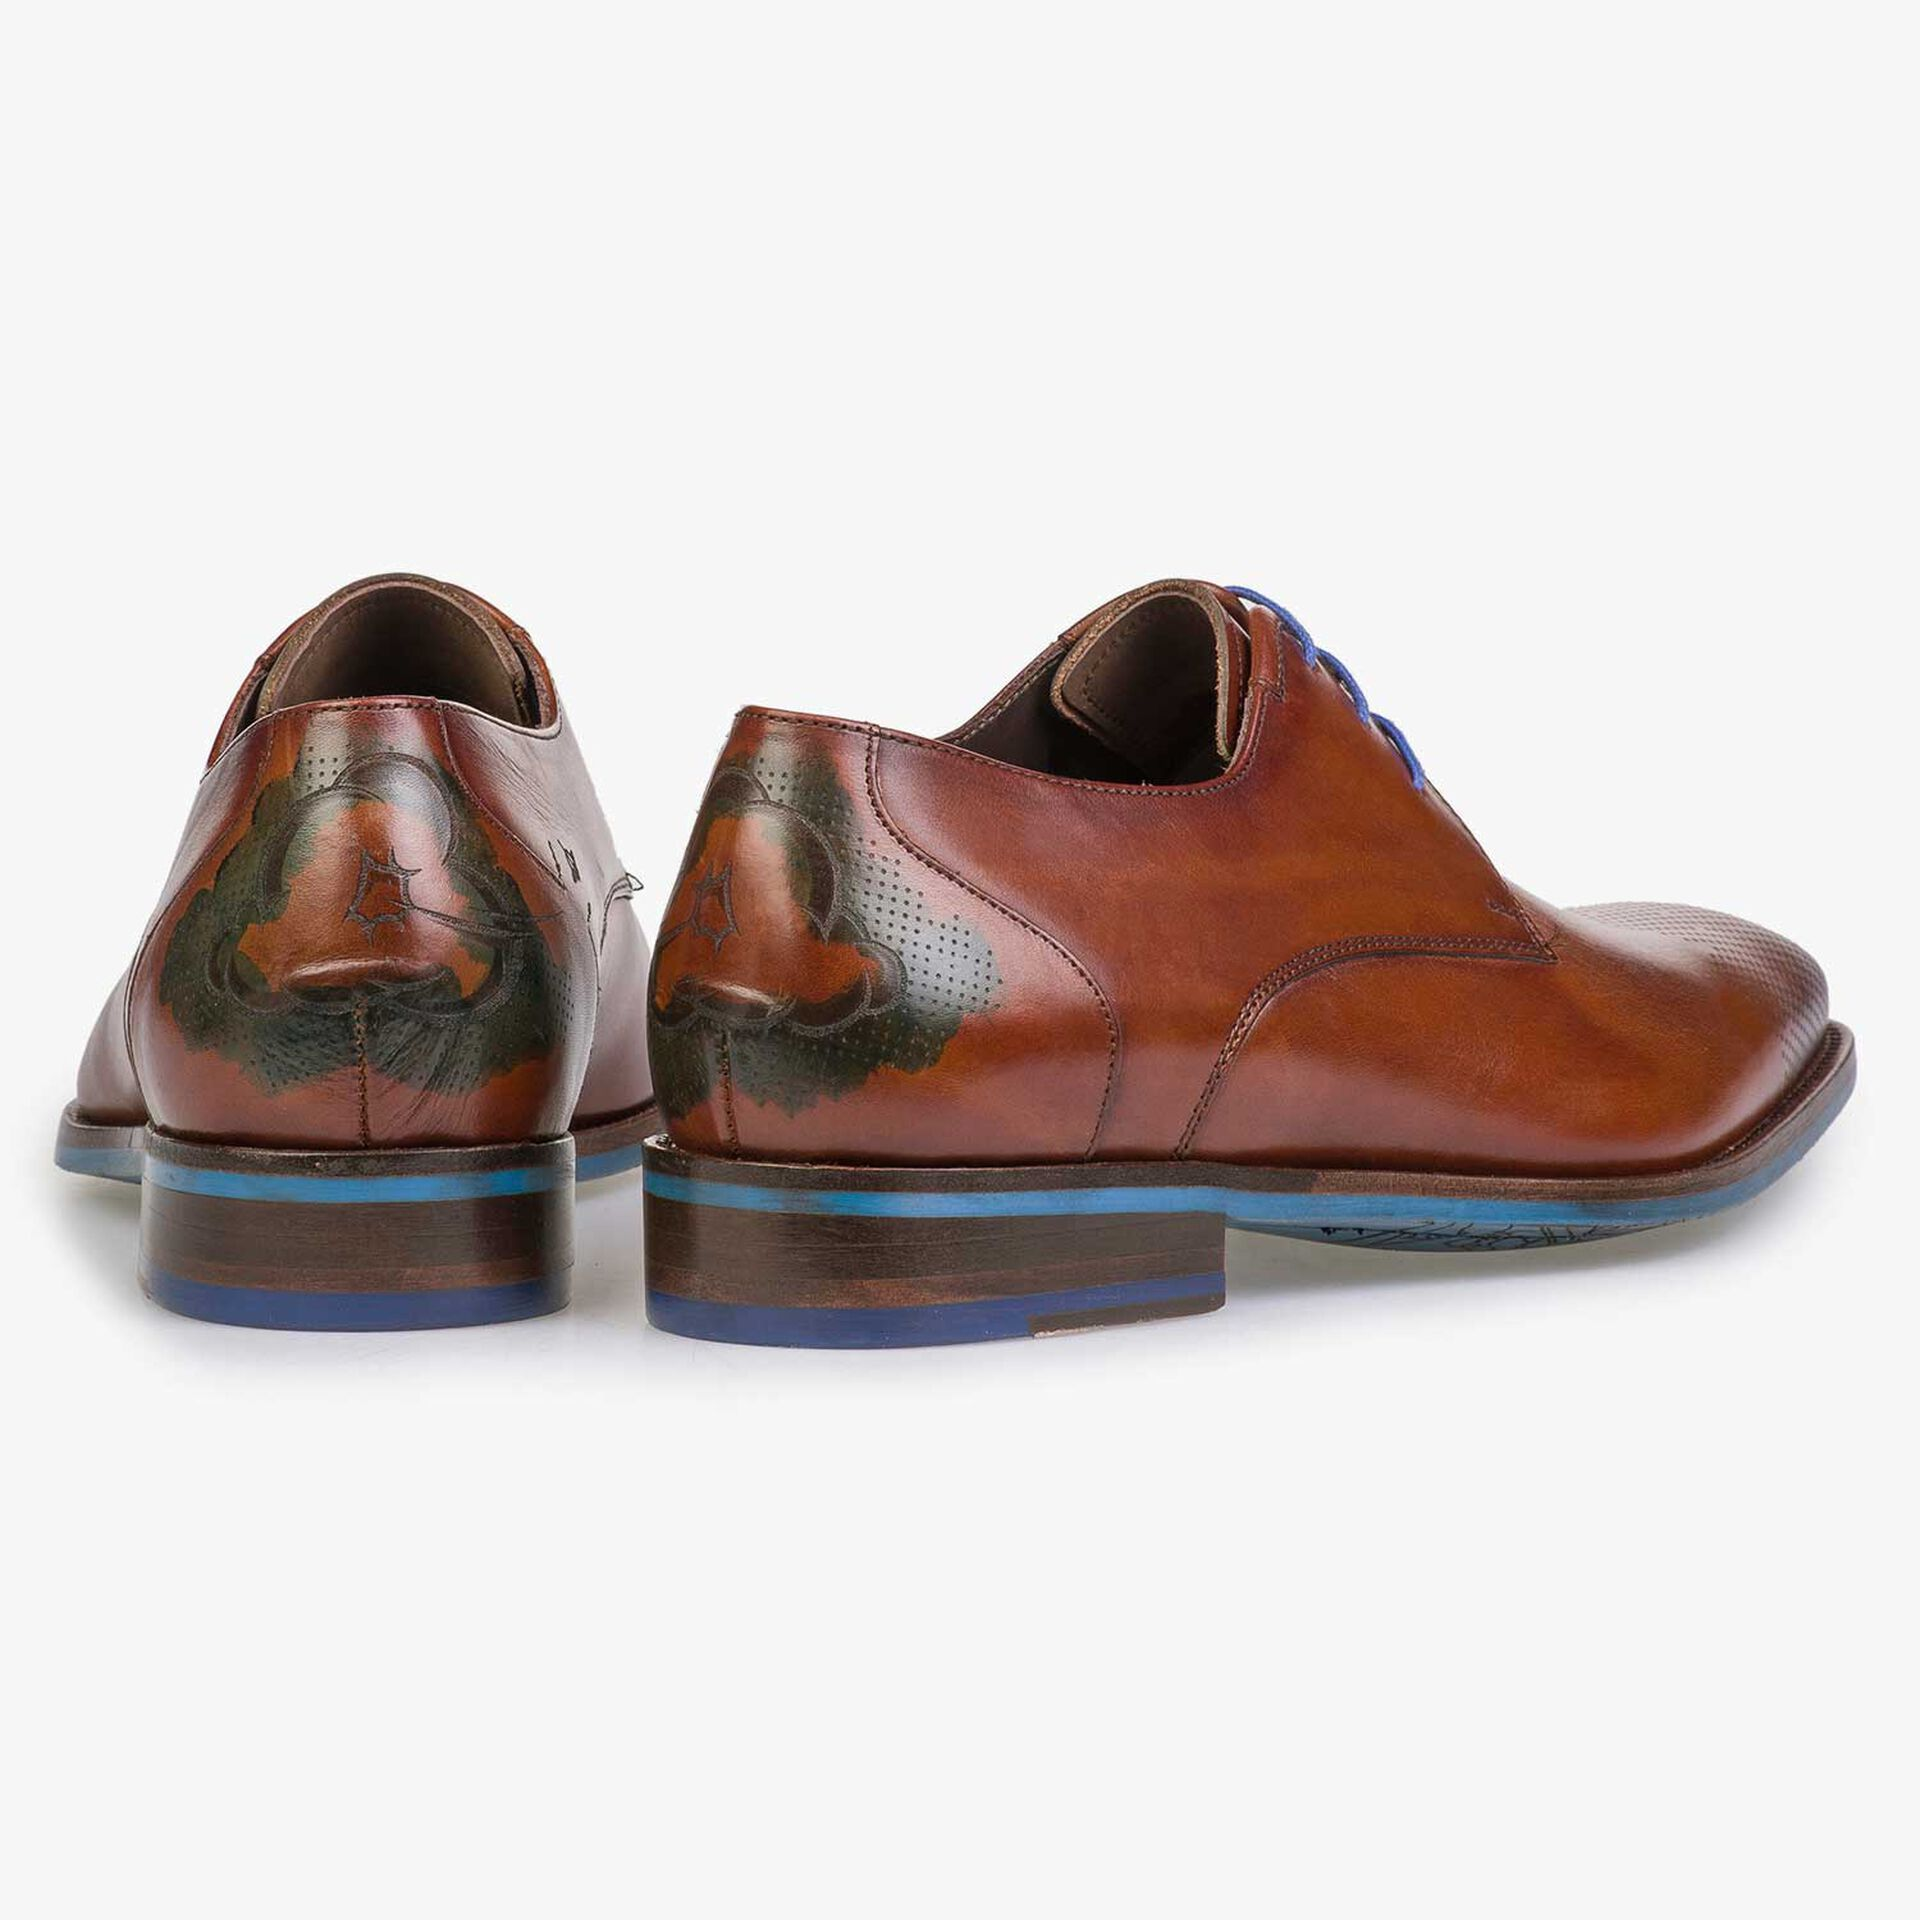 Cognac-coloured leather lace shoe with cloud pattern